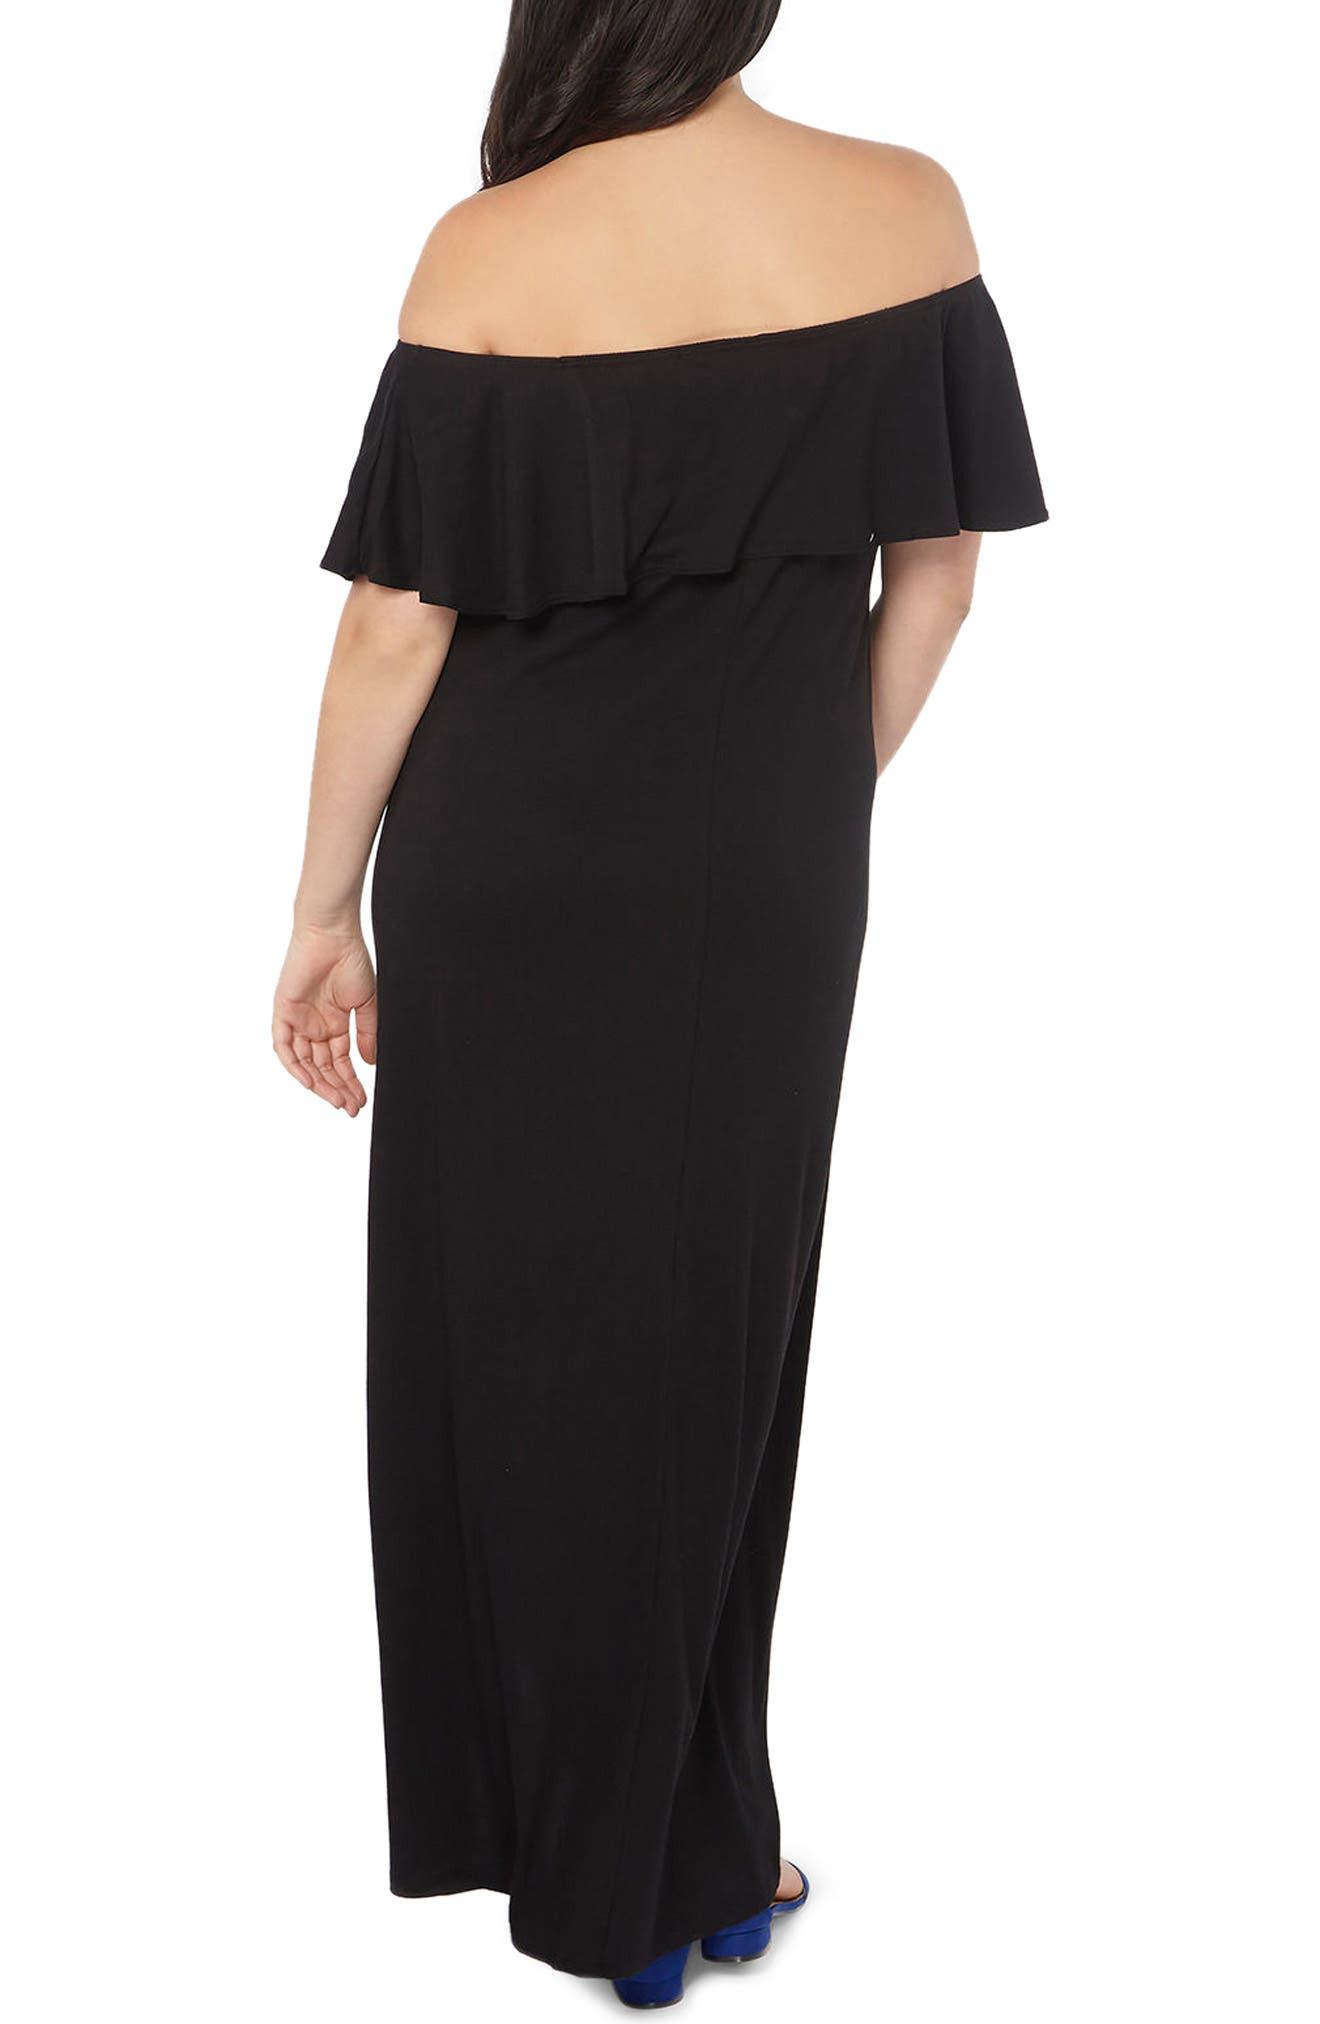 Alternate Image 2  - Evans Embroidered Off the Shoulder Maxi Dress (Plus Size)